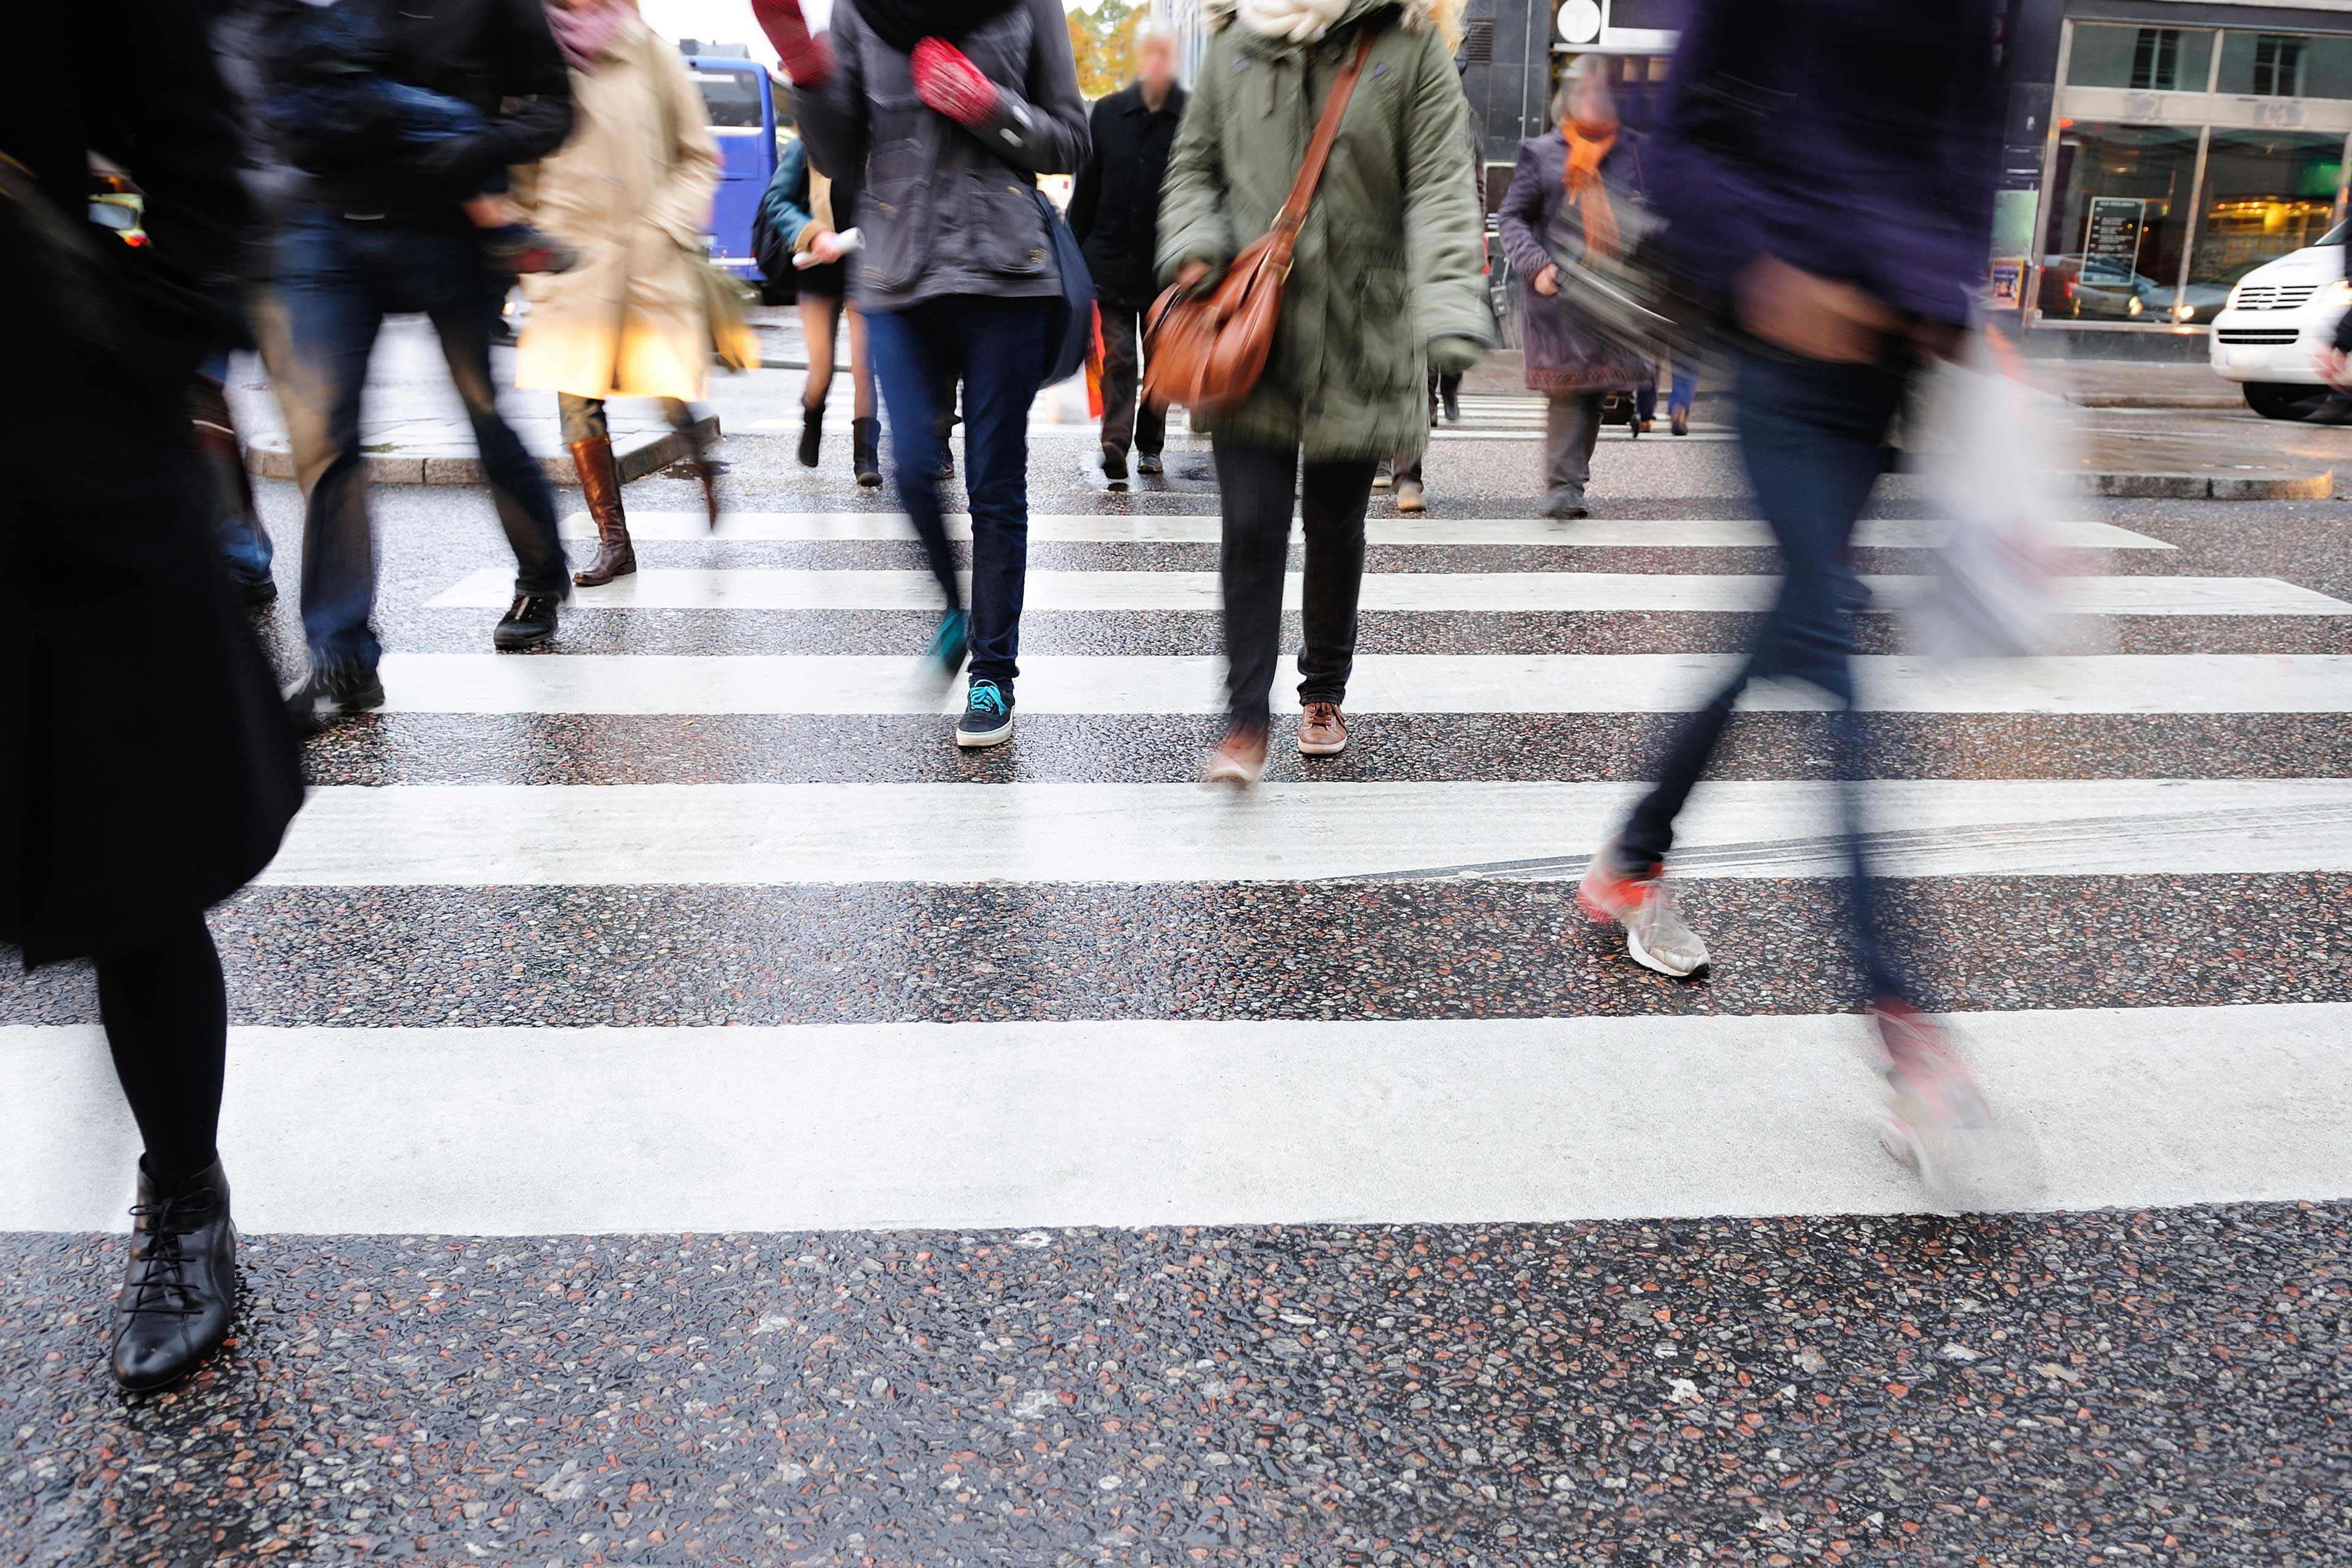 EY - Crowd using pedestrian crossing